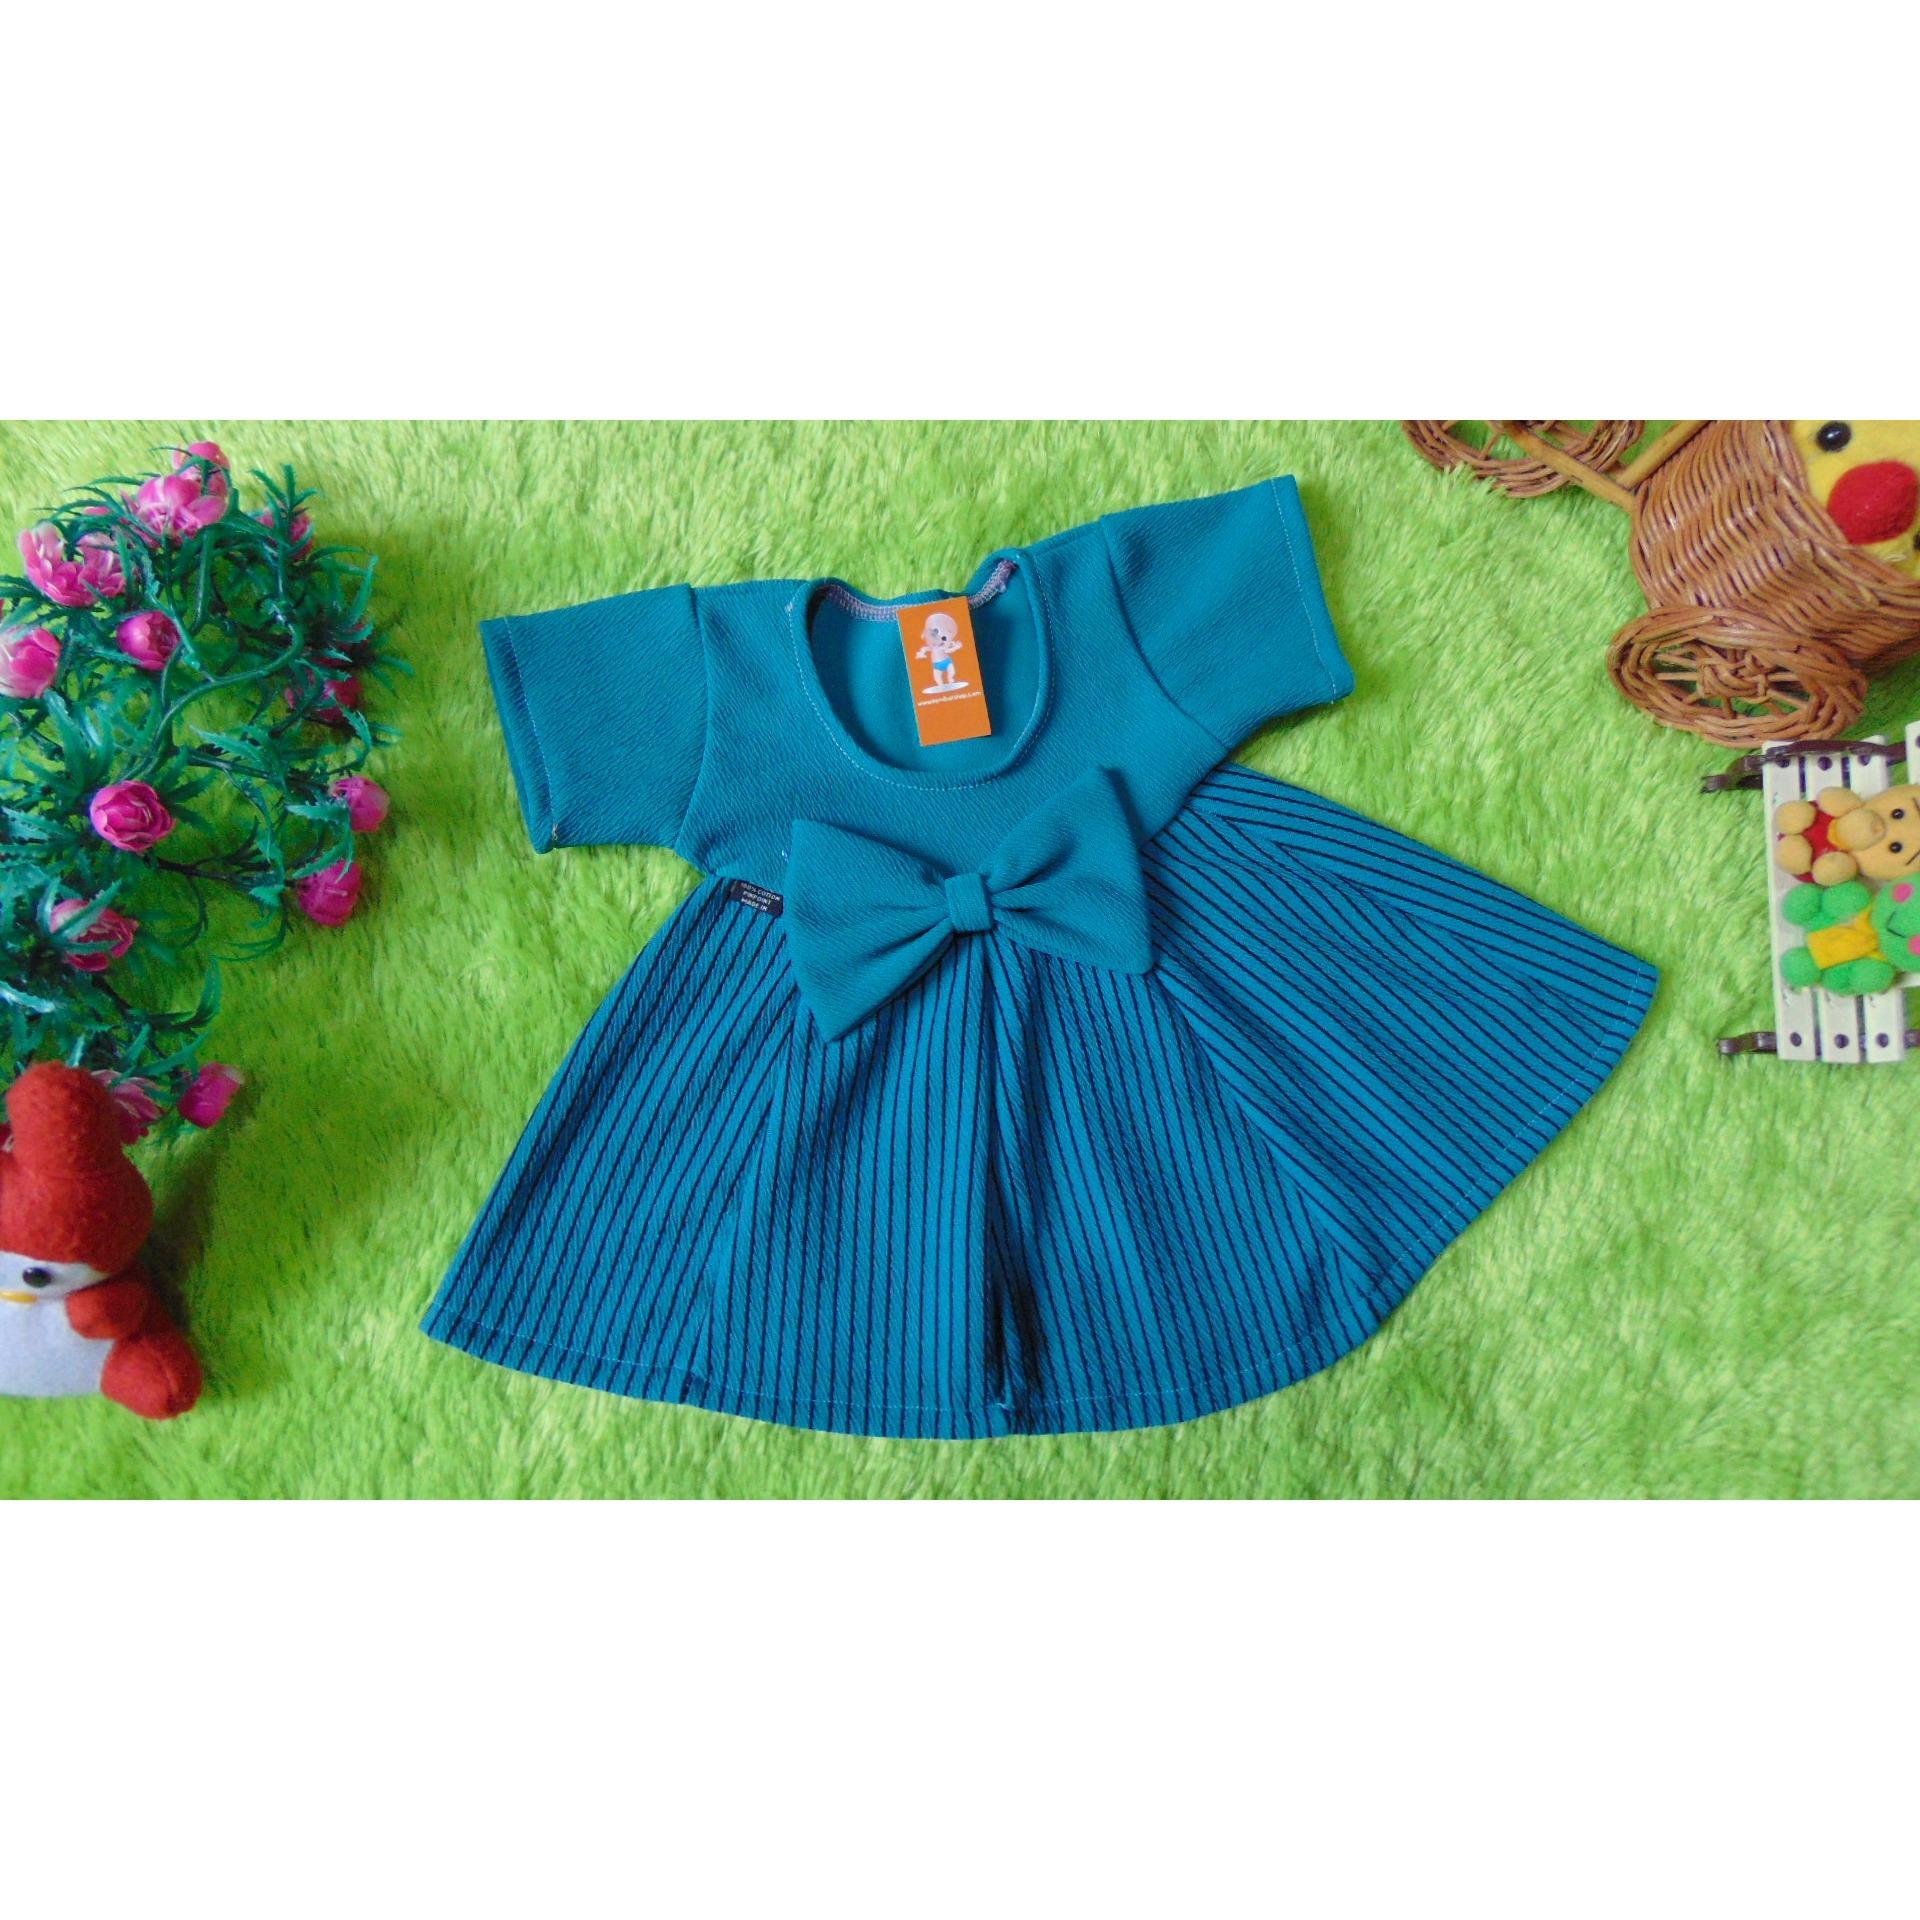 kembarshop - kembarshop - dress baju pesta anak bayi perempuan cewek newborn 0-6bulan pita pastel salur hijau tosca